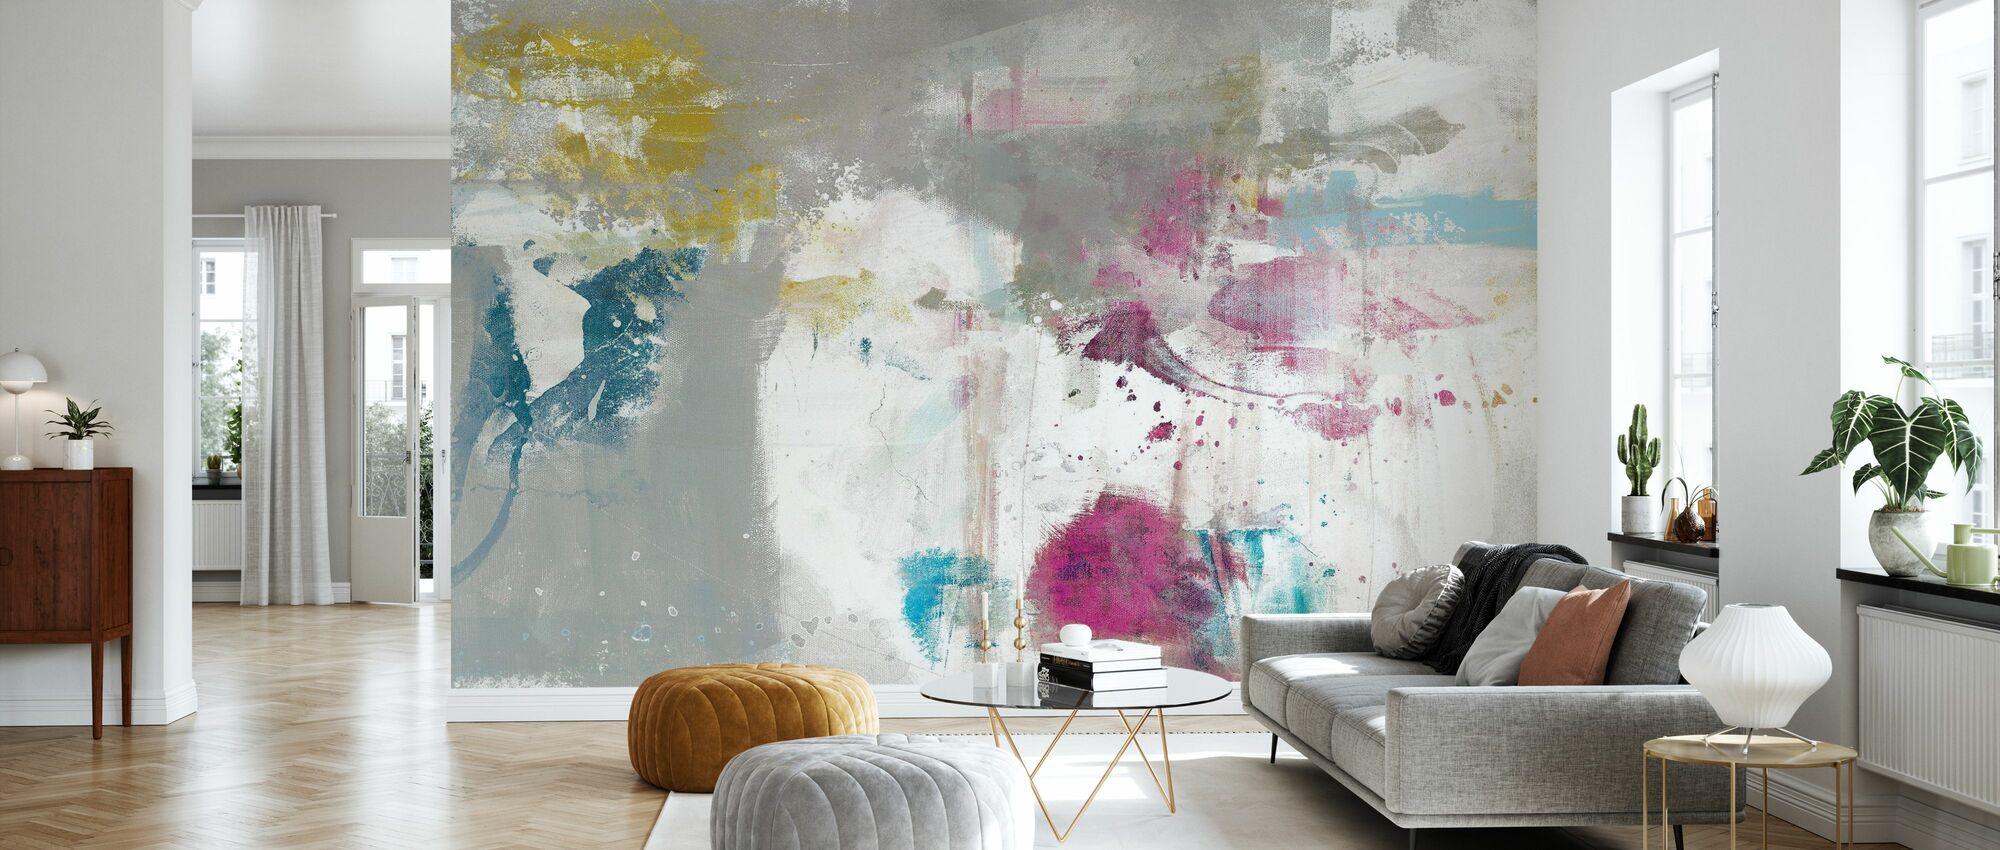 Minute - Wallpaper - Living Room